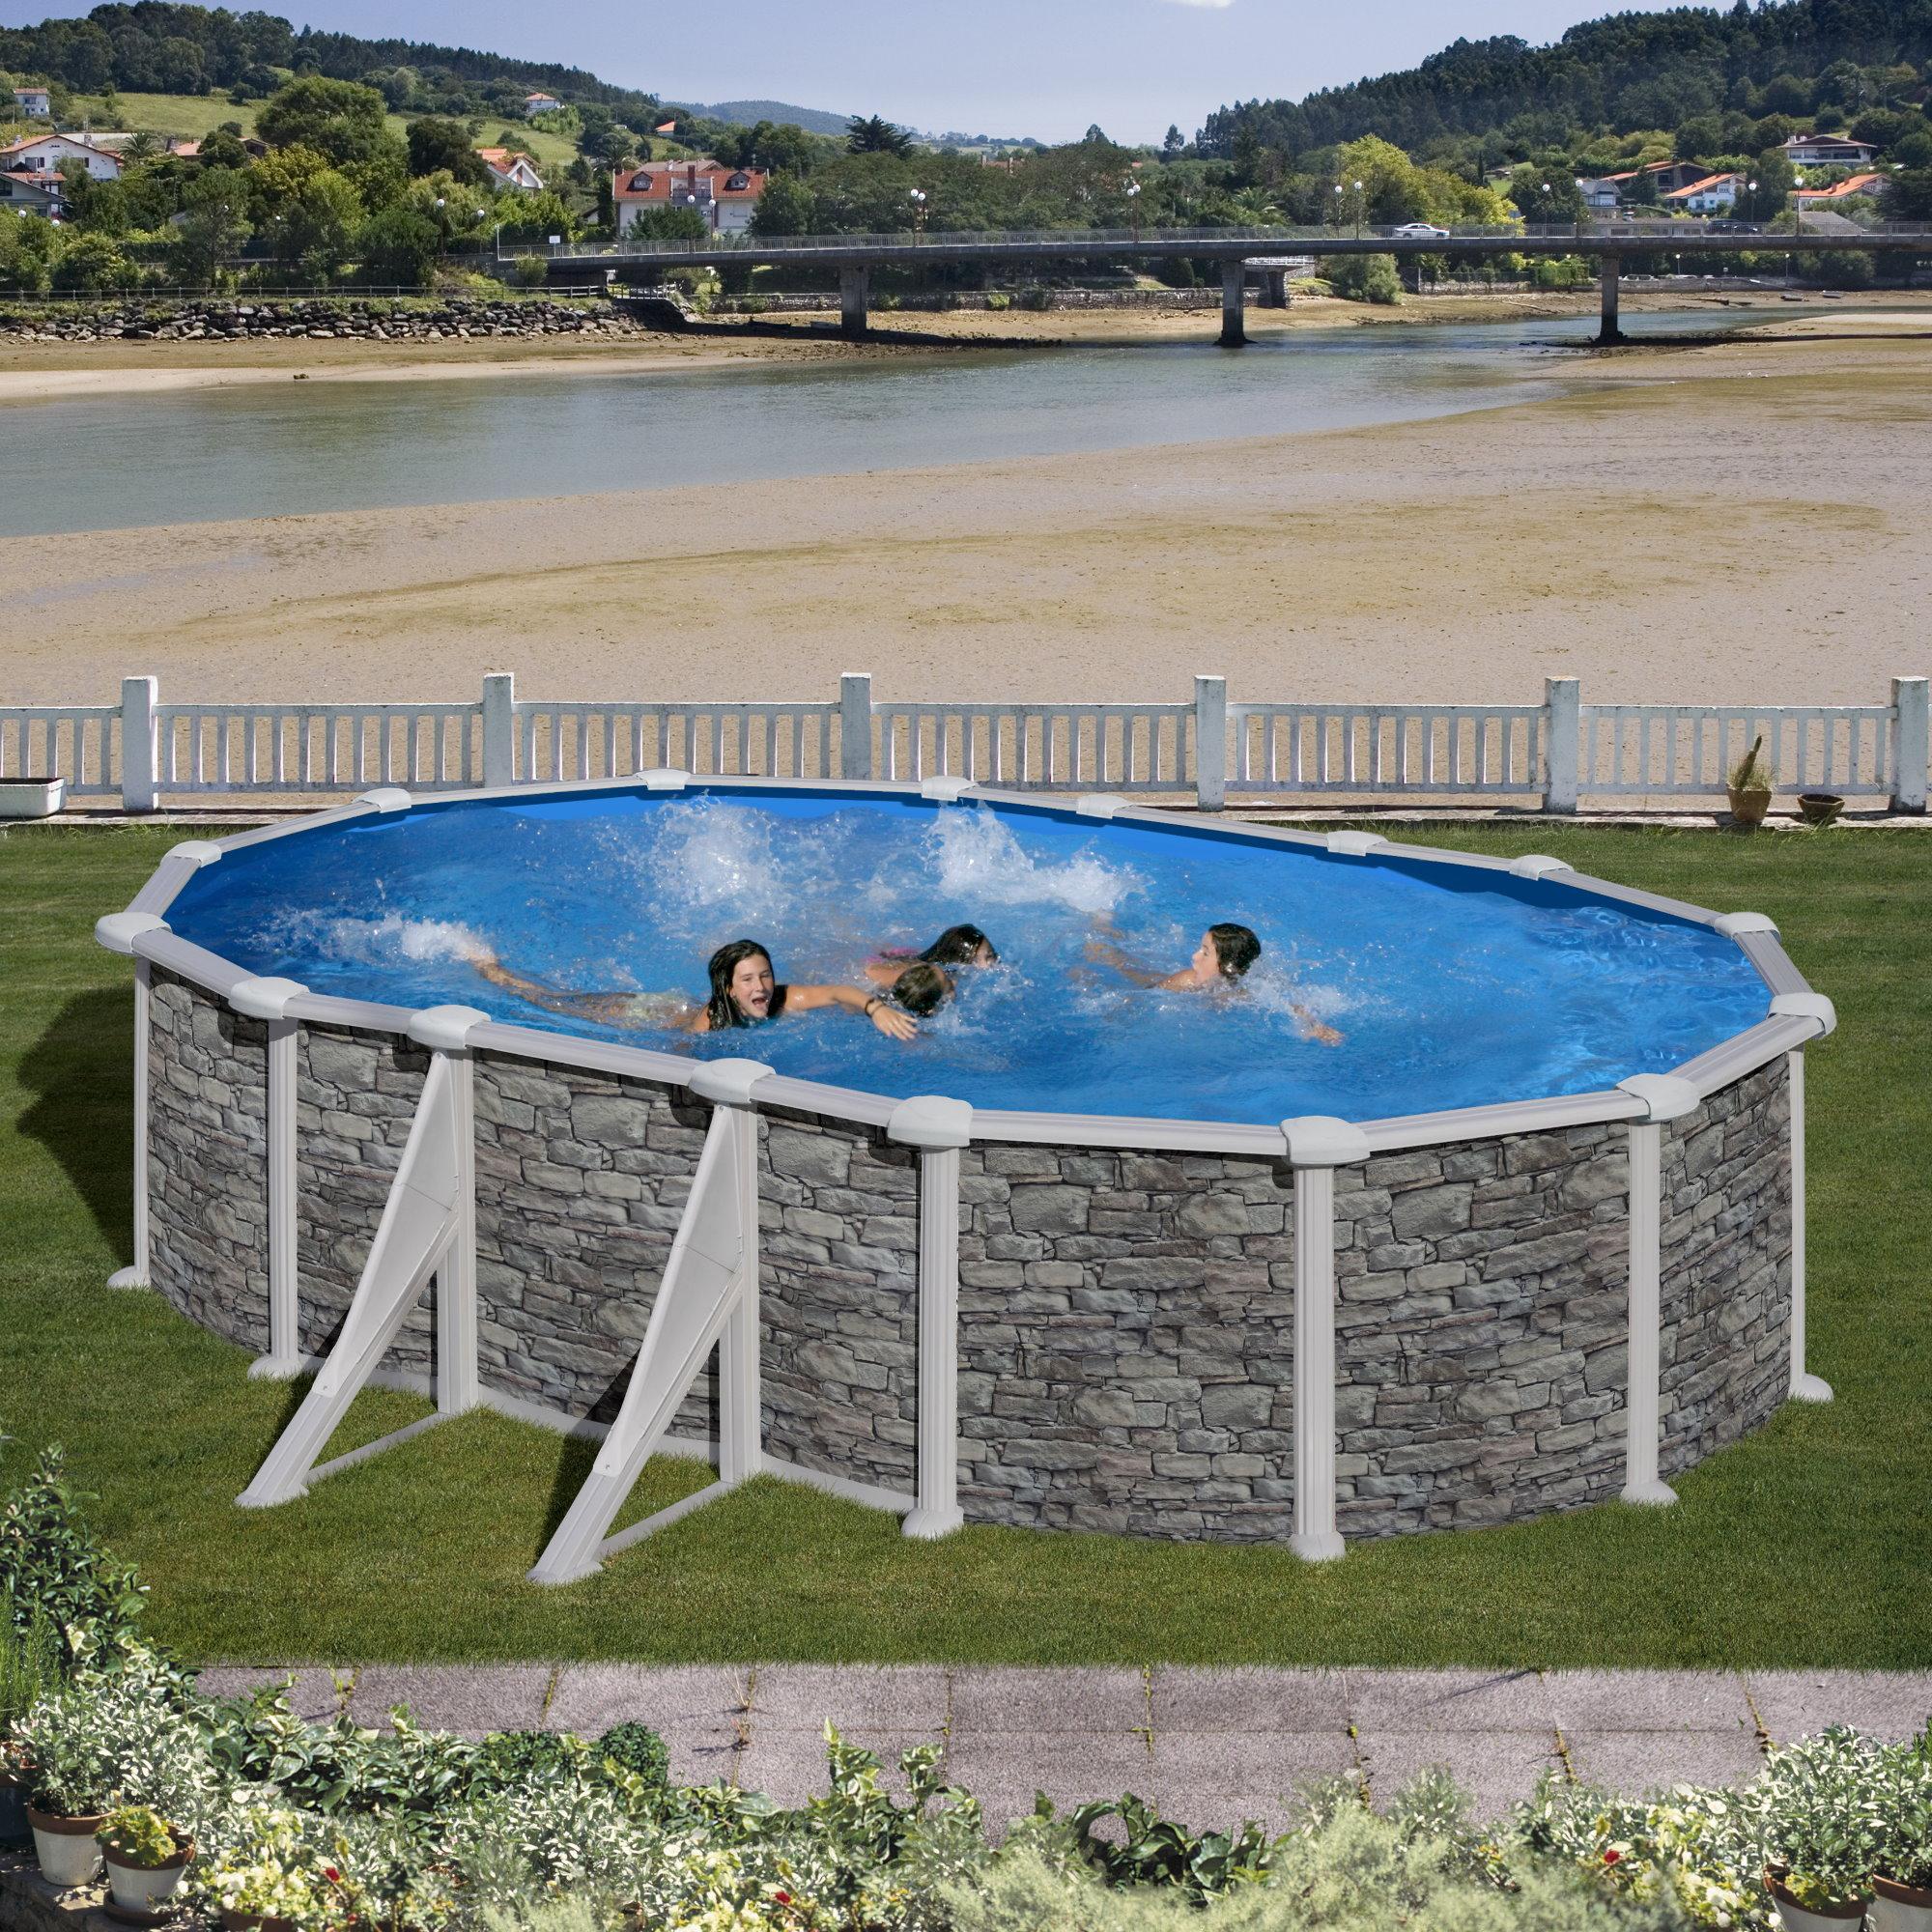 ovalformbeckenset steinoptik corcega 730 x 375 x 132 cm. Black Bedroom Furniture Sets. Home Design Ideas